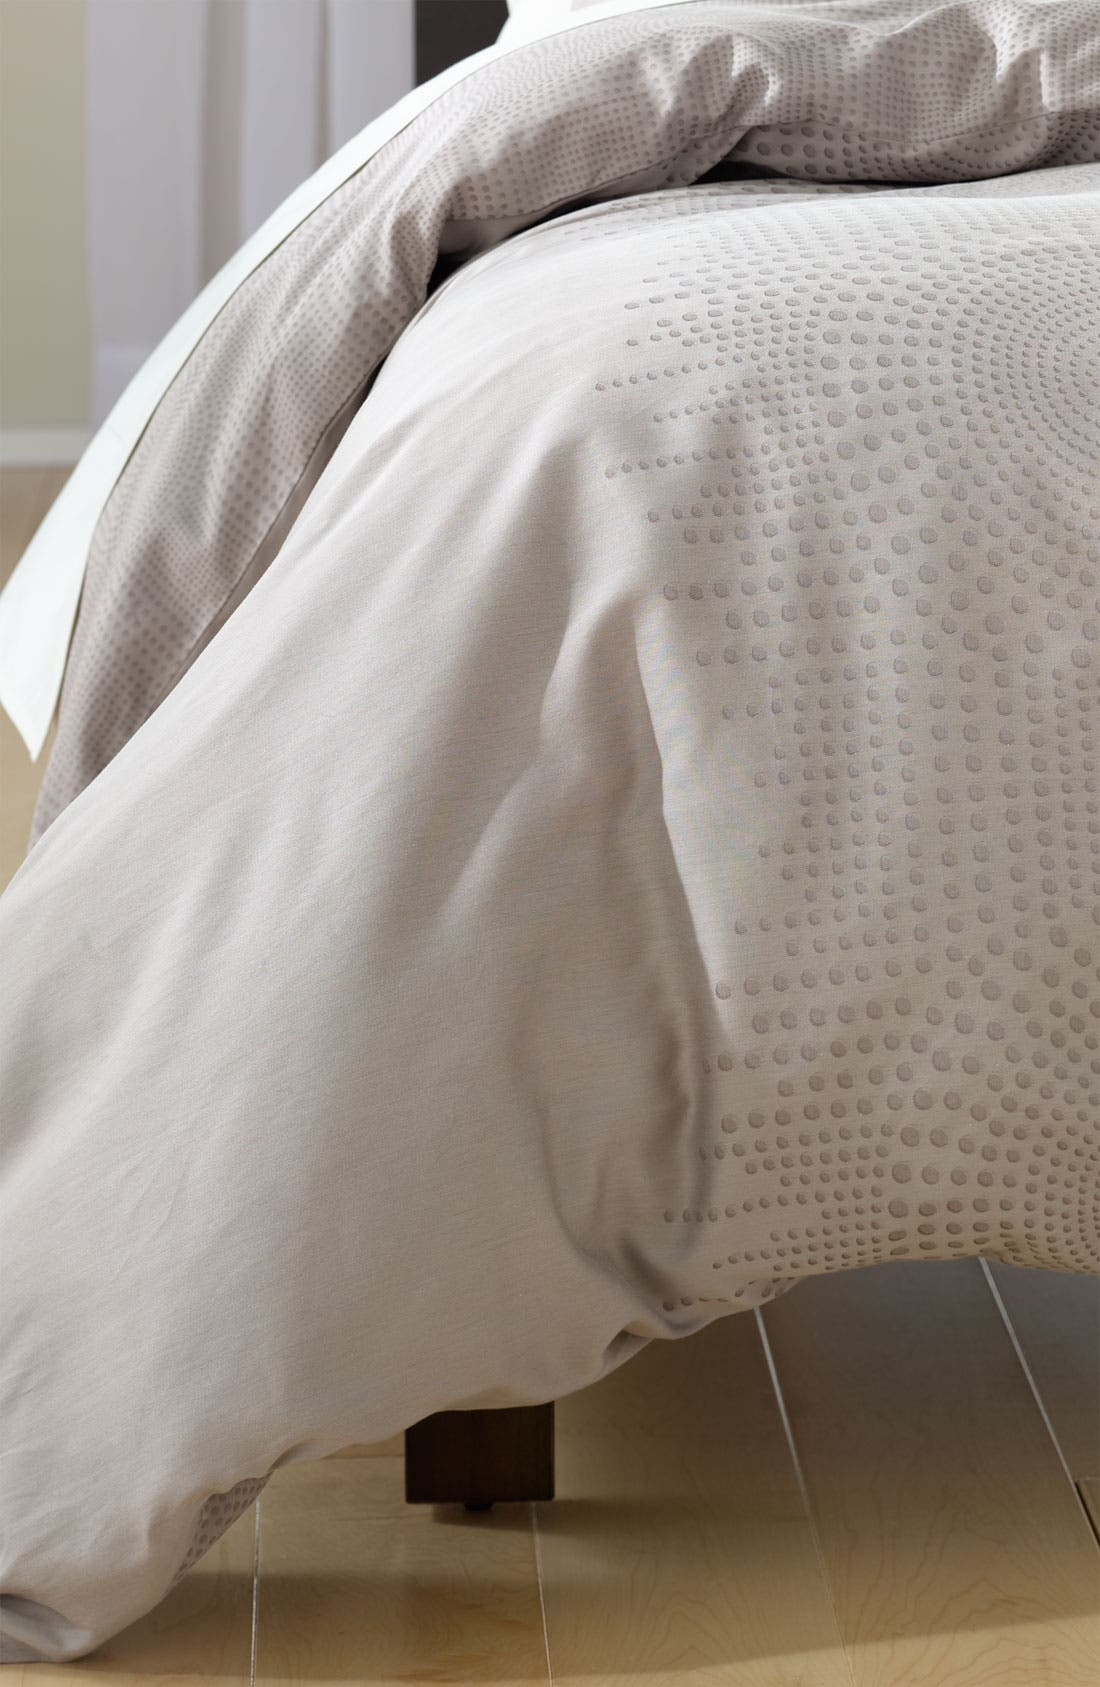 Alternate Image 1 Selected - Nordstrom at Home 'Raindrops' Jacquard Duvet Cover